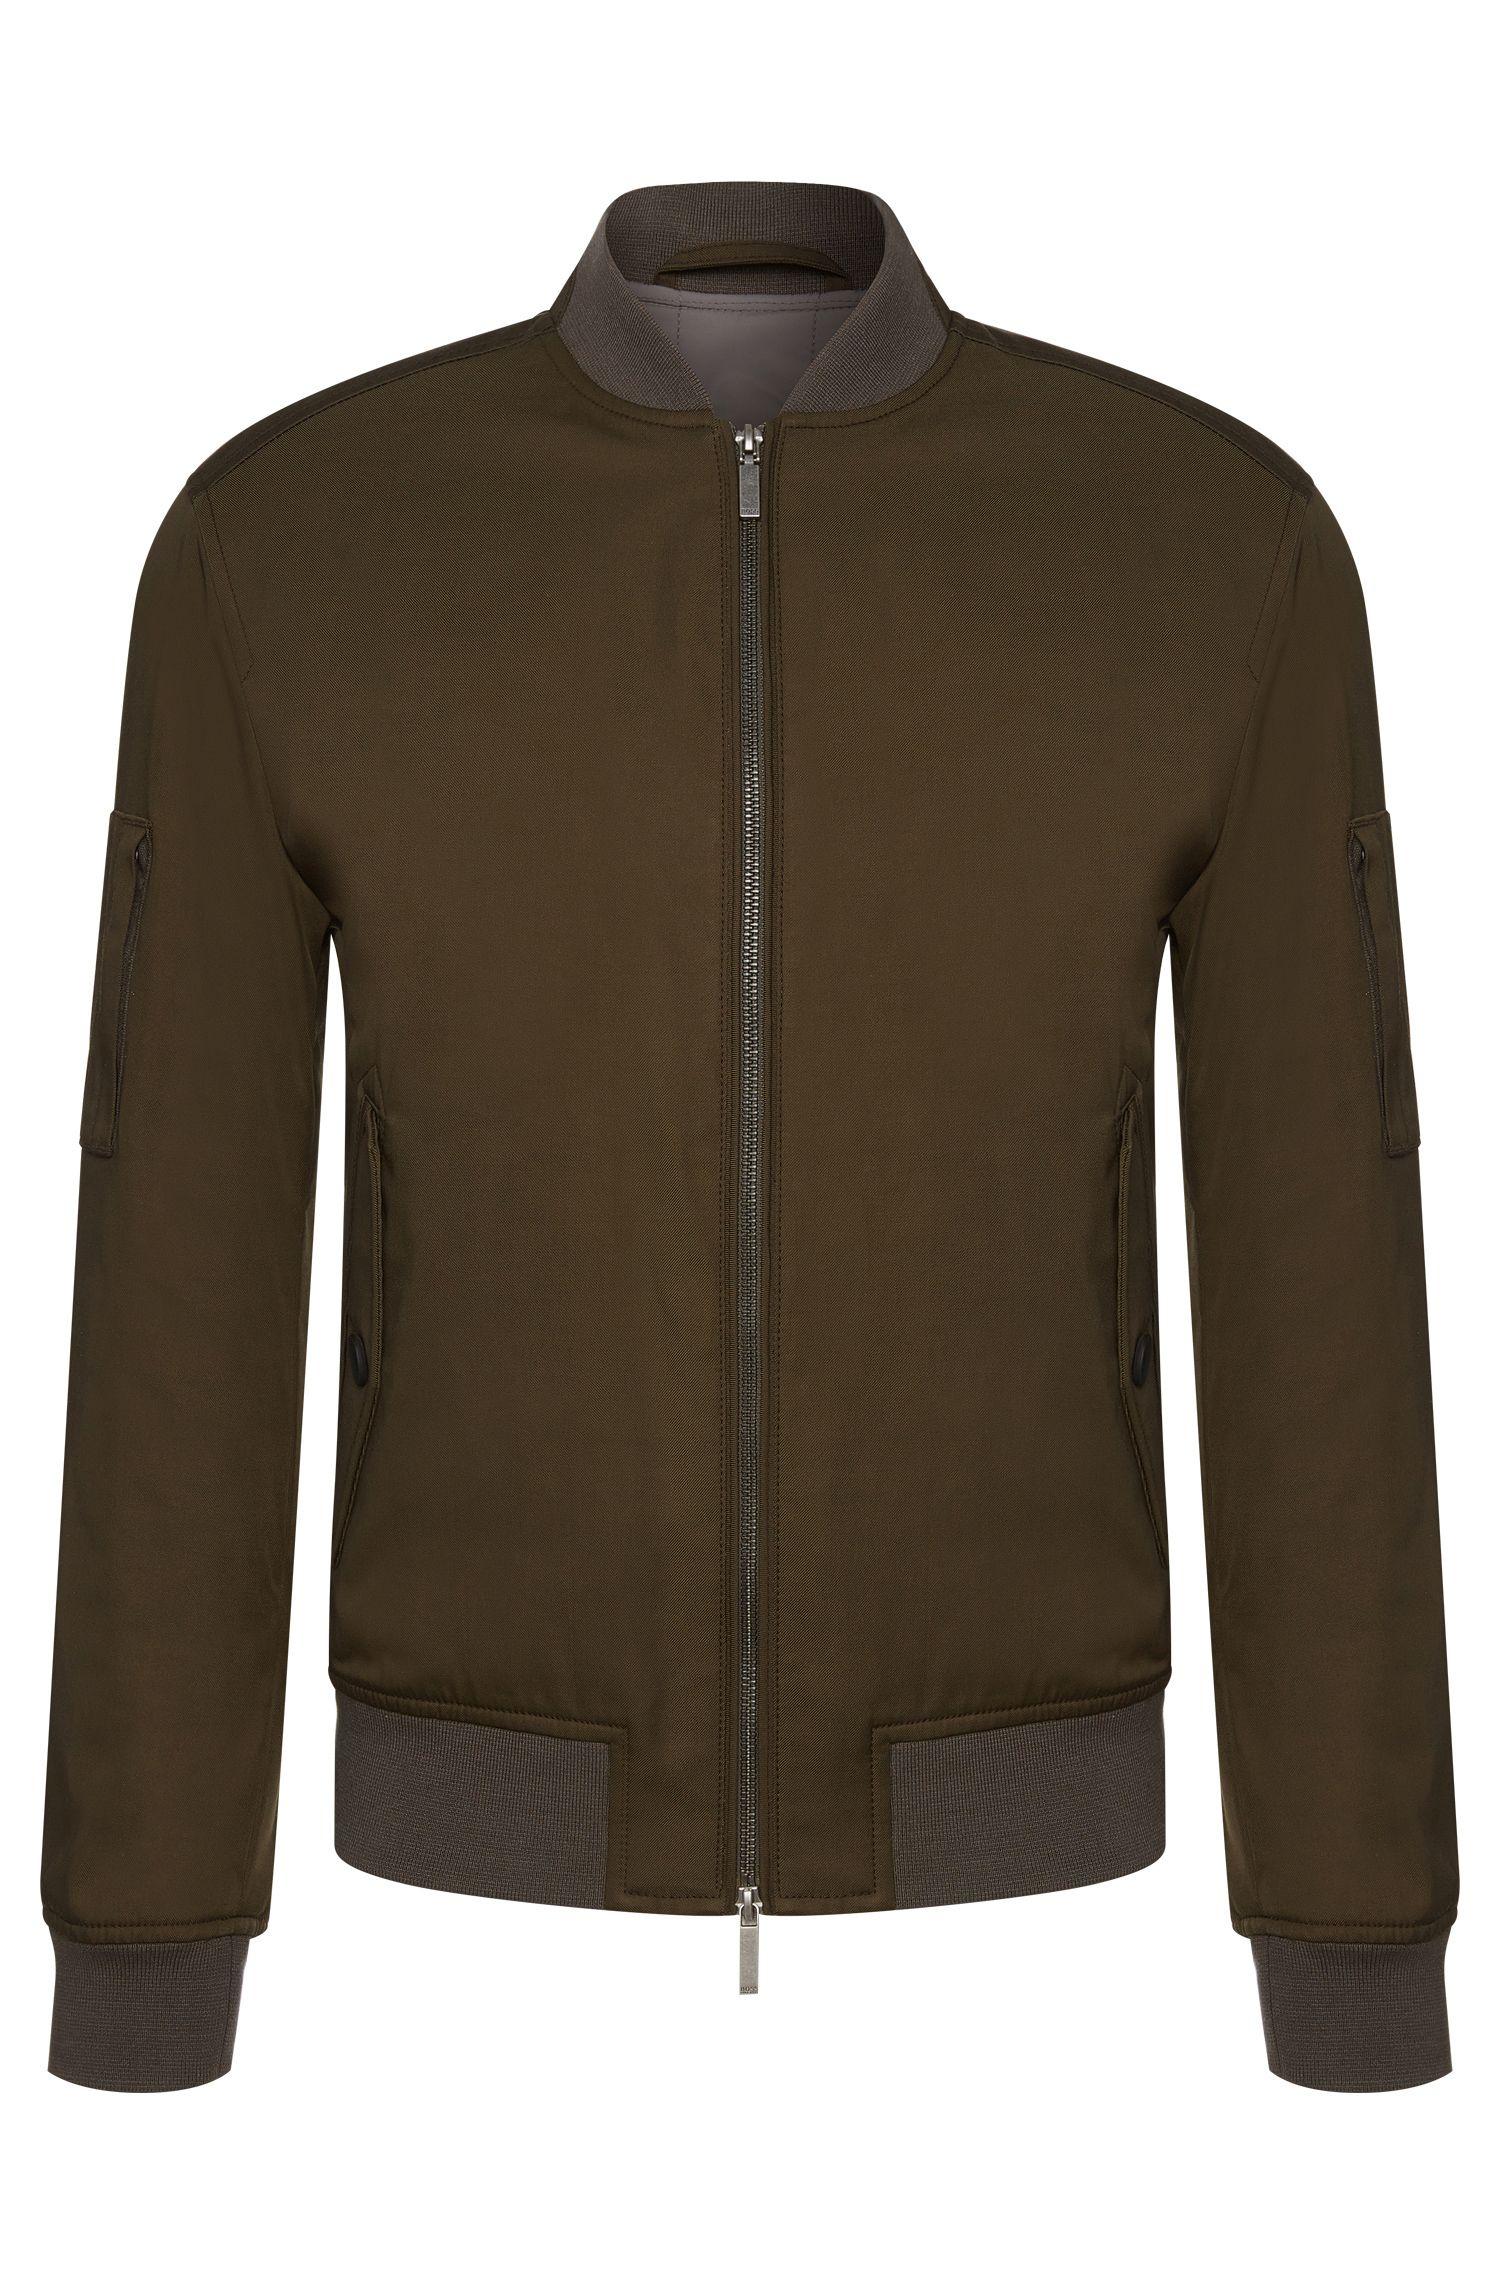 'Clone' | Cotton Blend Bomber Jacket